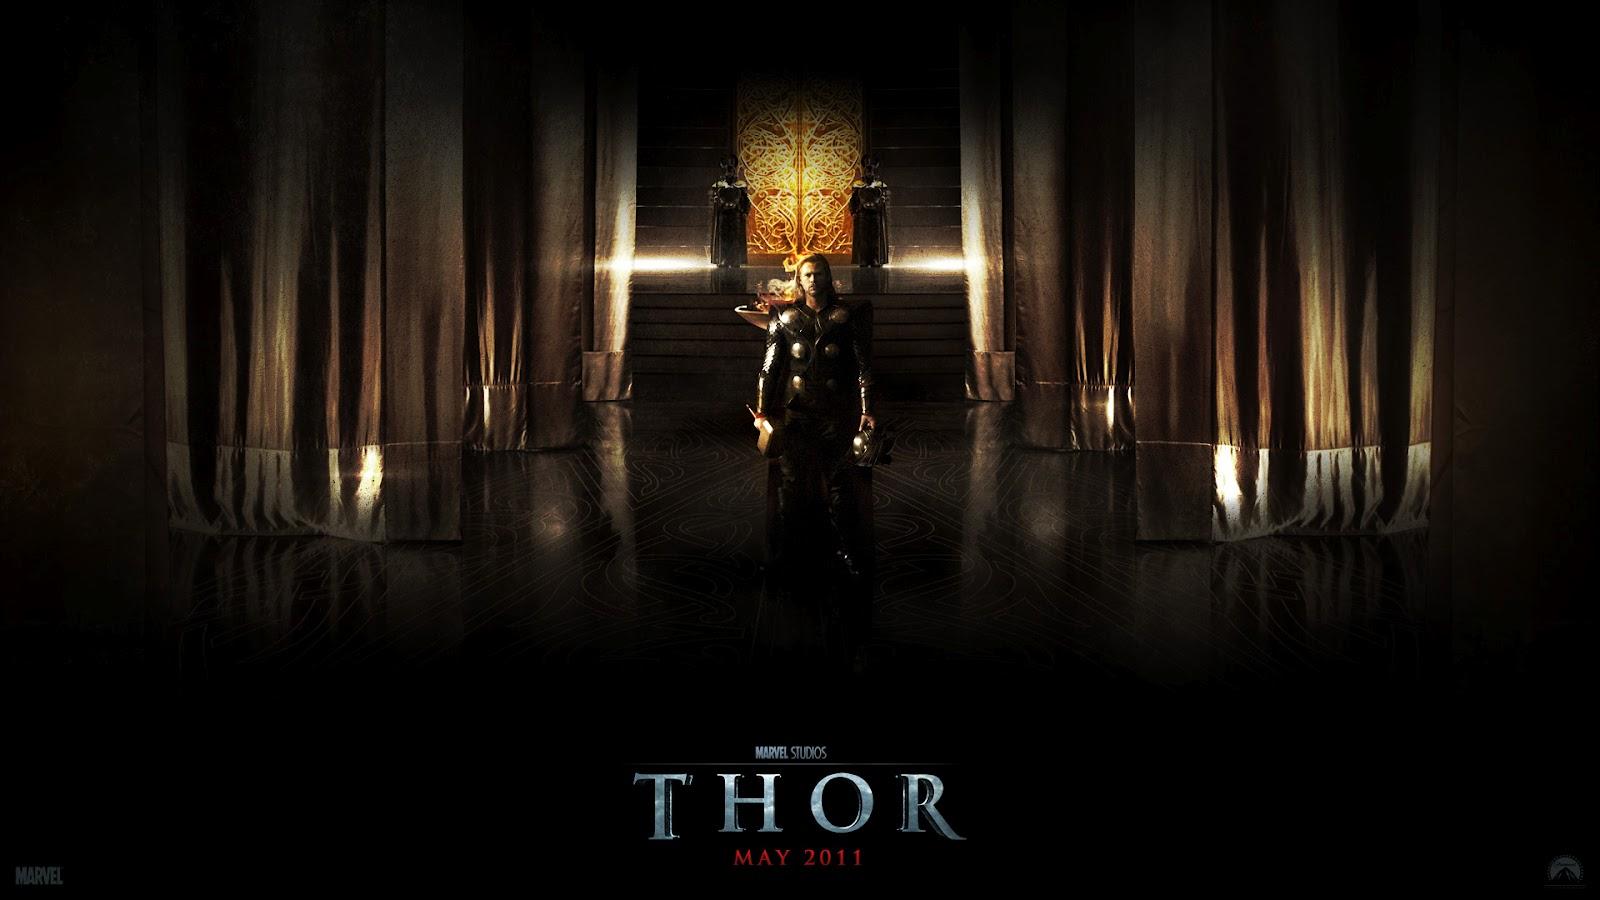 http://2.bp.blogspot.com/-U6ganVqTkZM/UBHmxm5_B-I/AAAAAAAACdA/_SqdcofaU8w/s1600/Thor-Movie-wallpaper-4.jpg